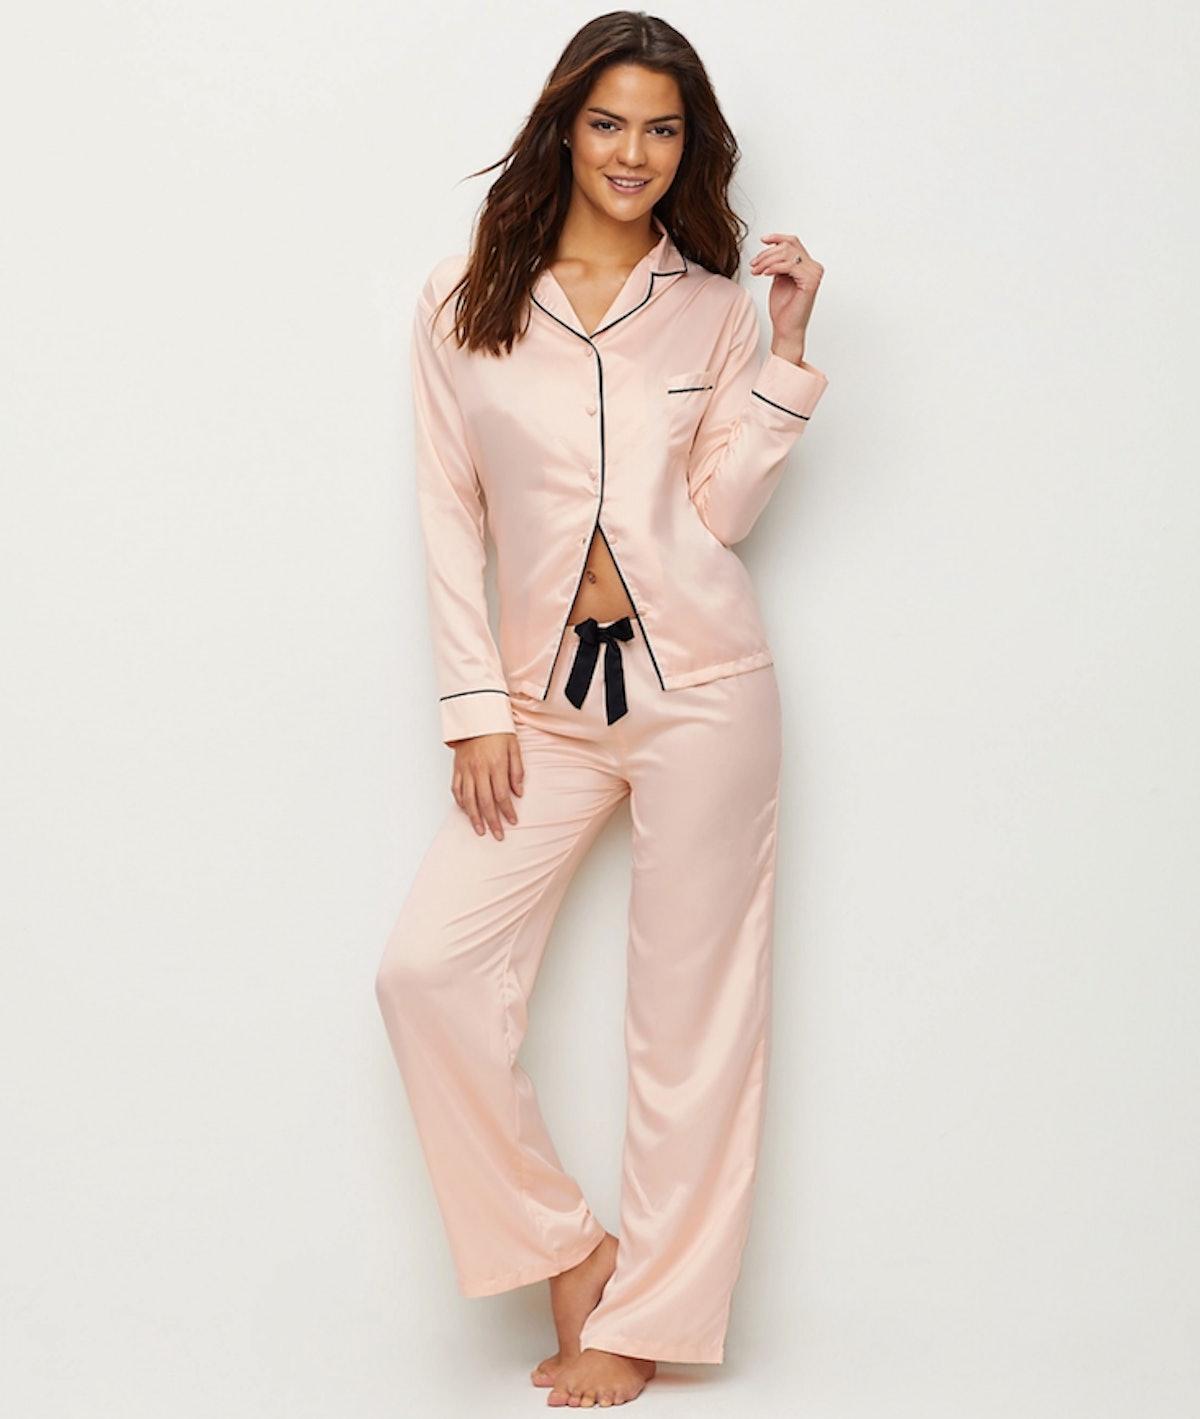 Bluebella Abigail Satin Pajama Set